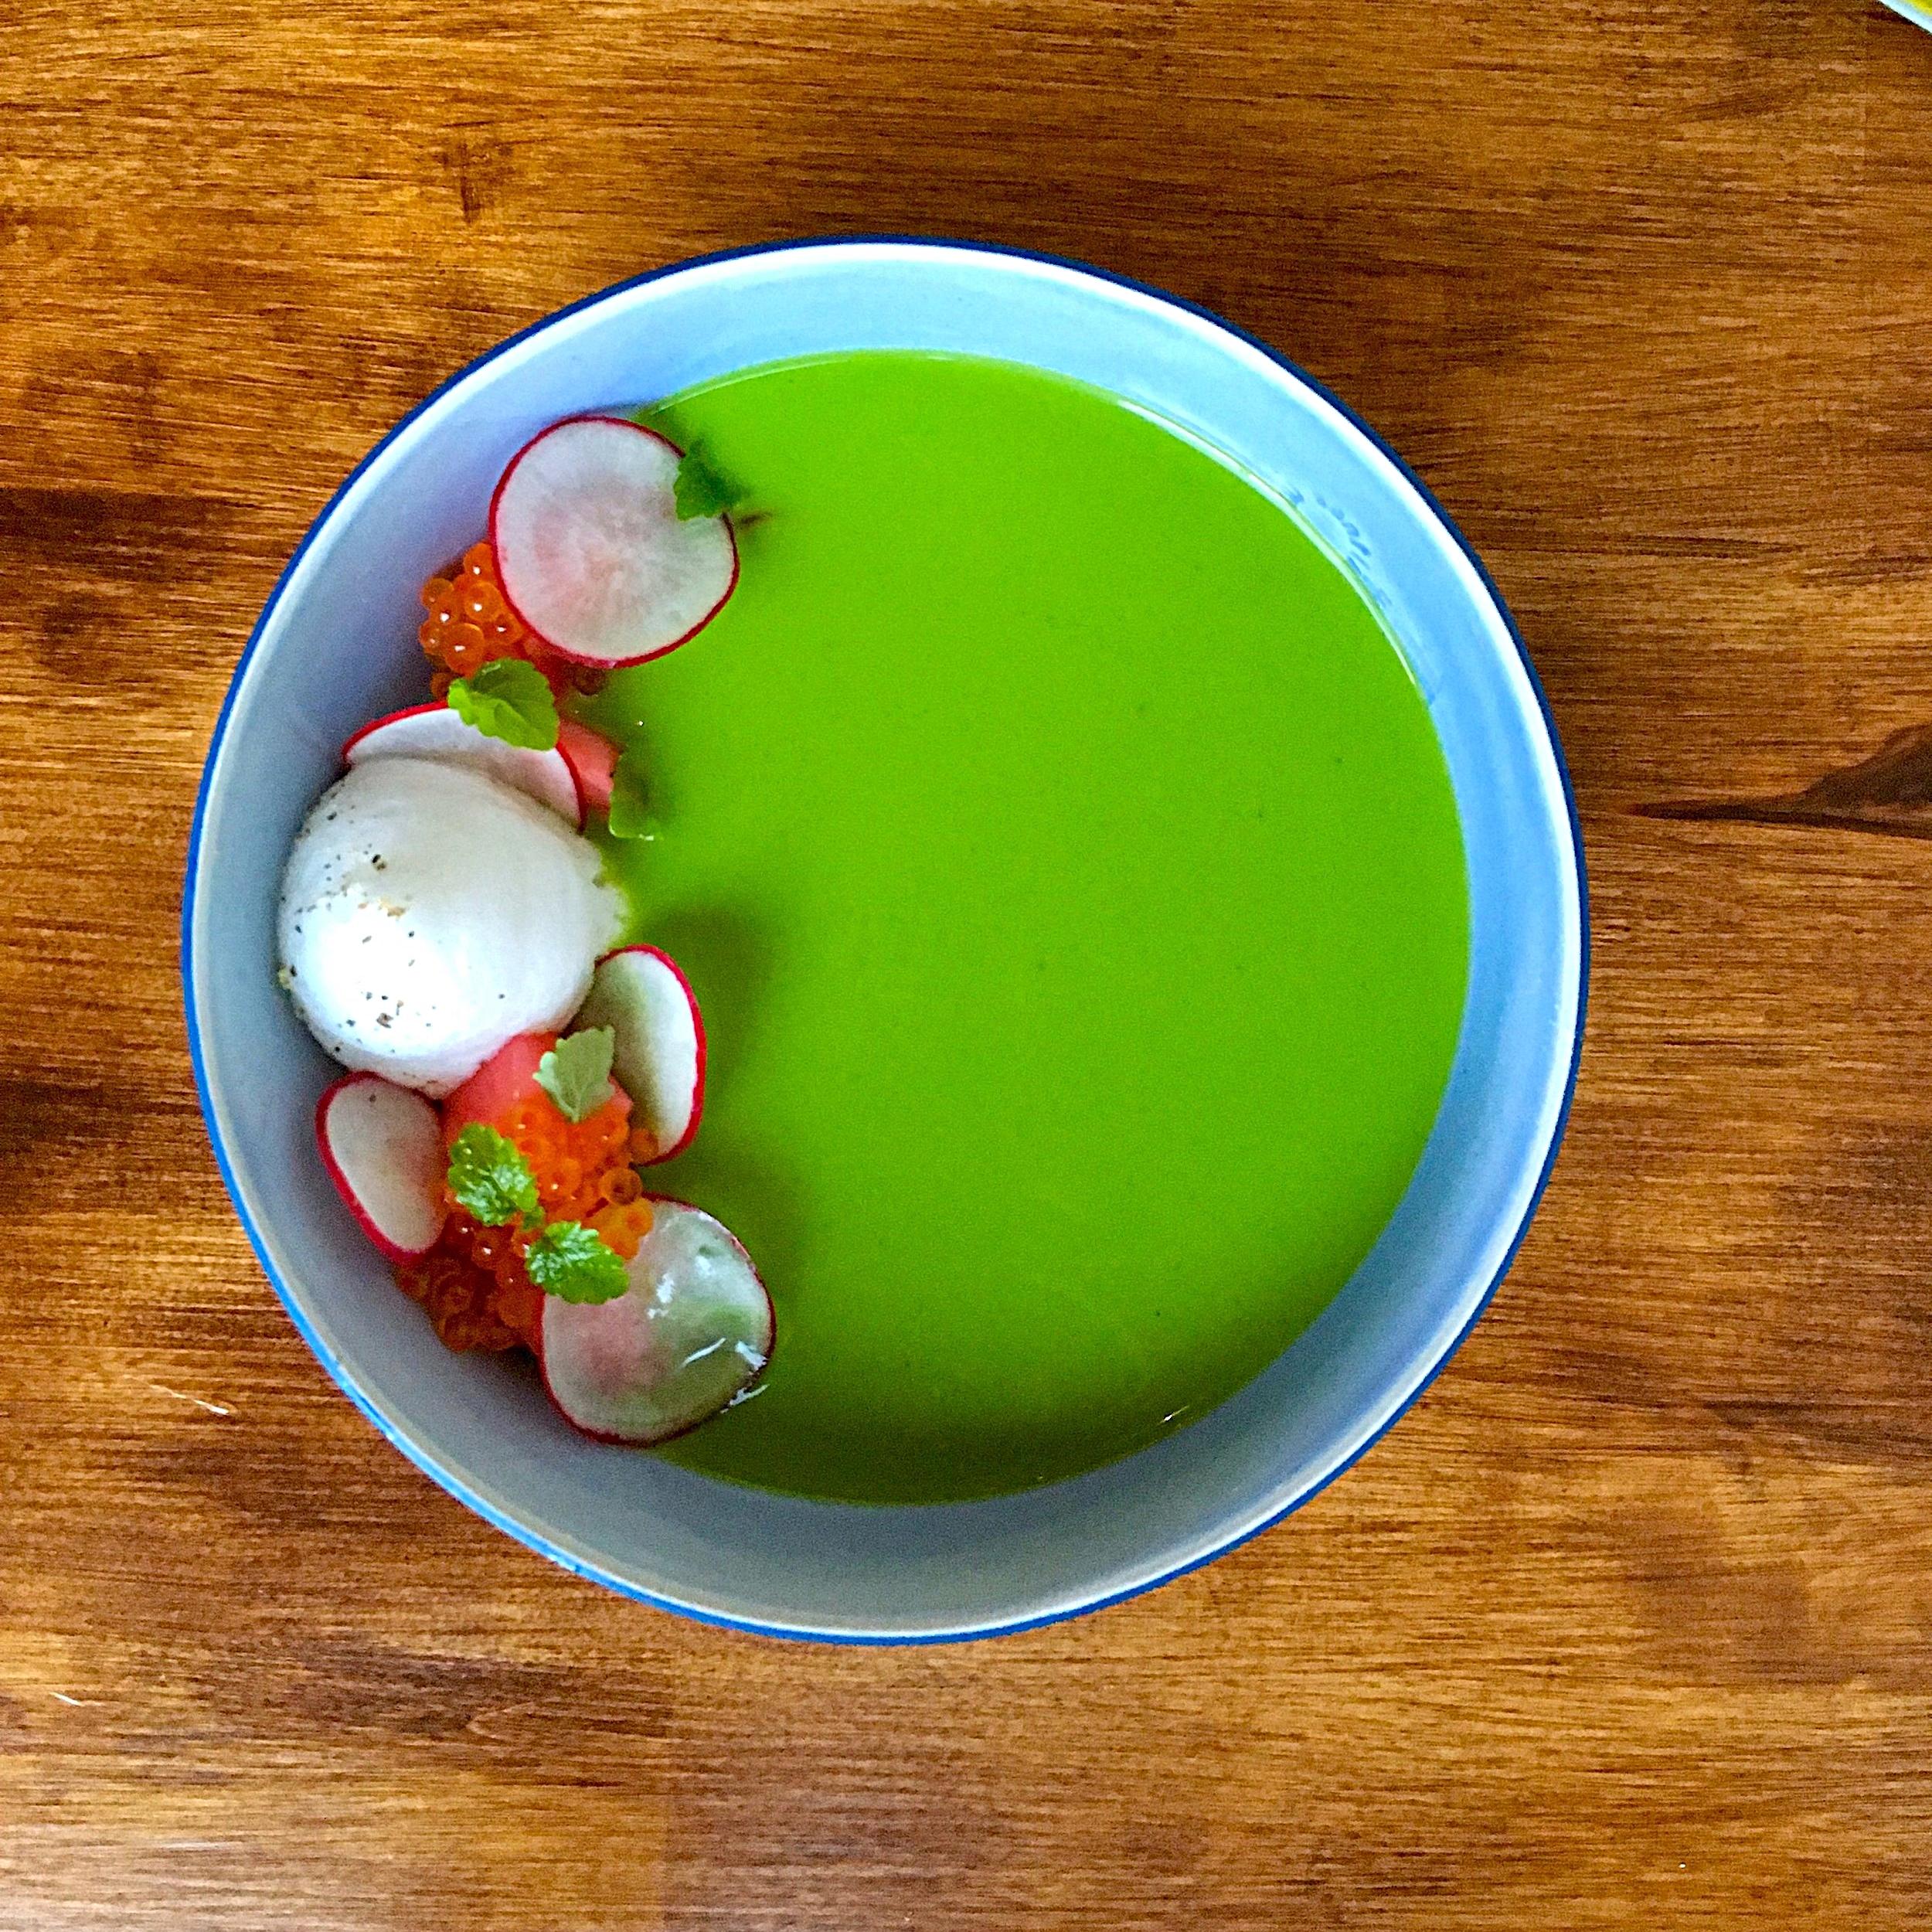 radish top gazpacho, smoked trout roe, lemon balm